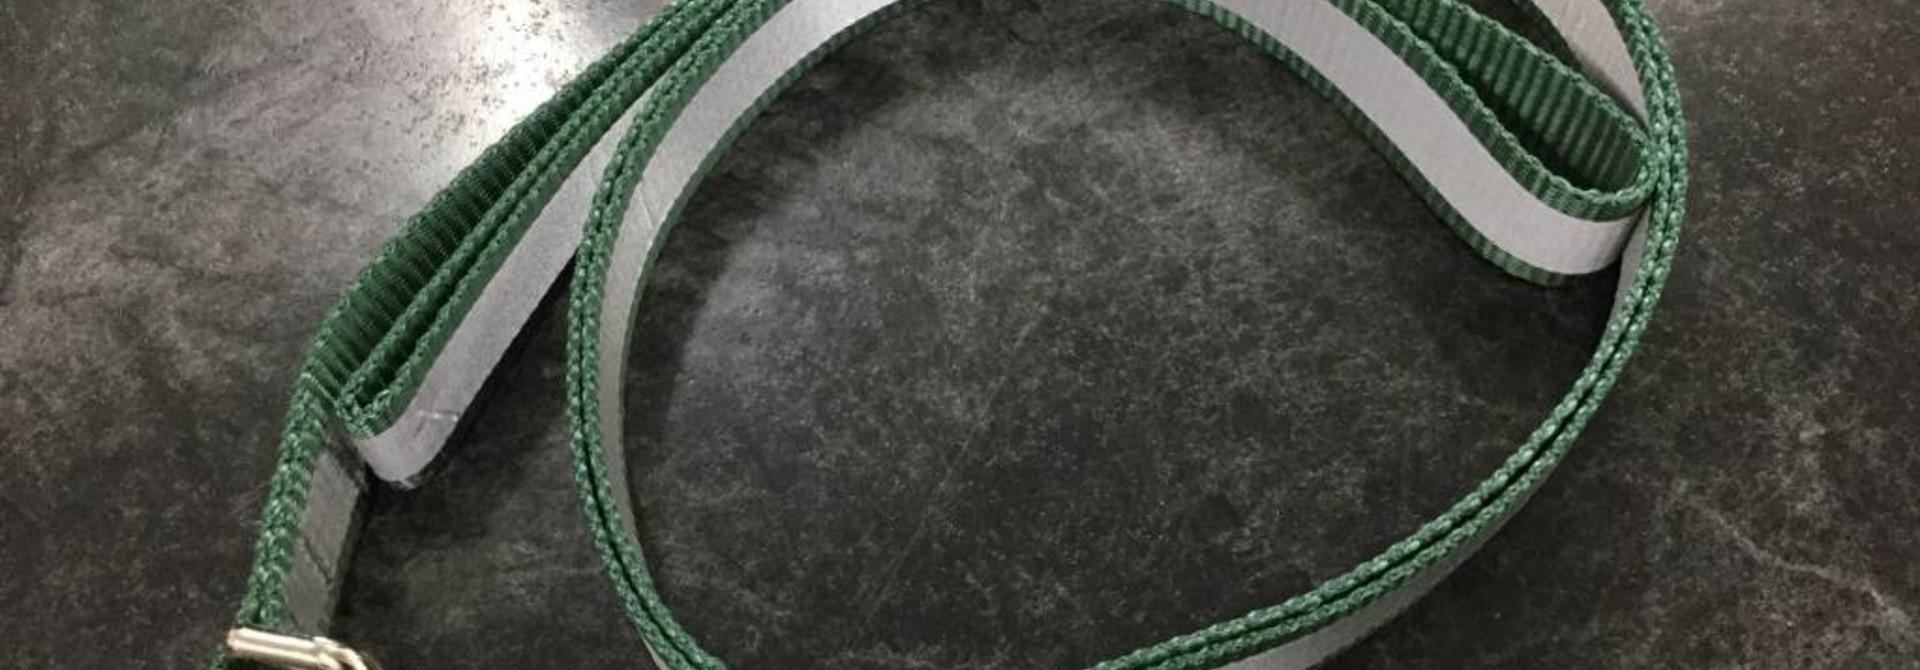 "1"" Wide x 6 Feet Long Reflective Nylon Dog Leash Green"